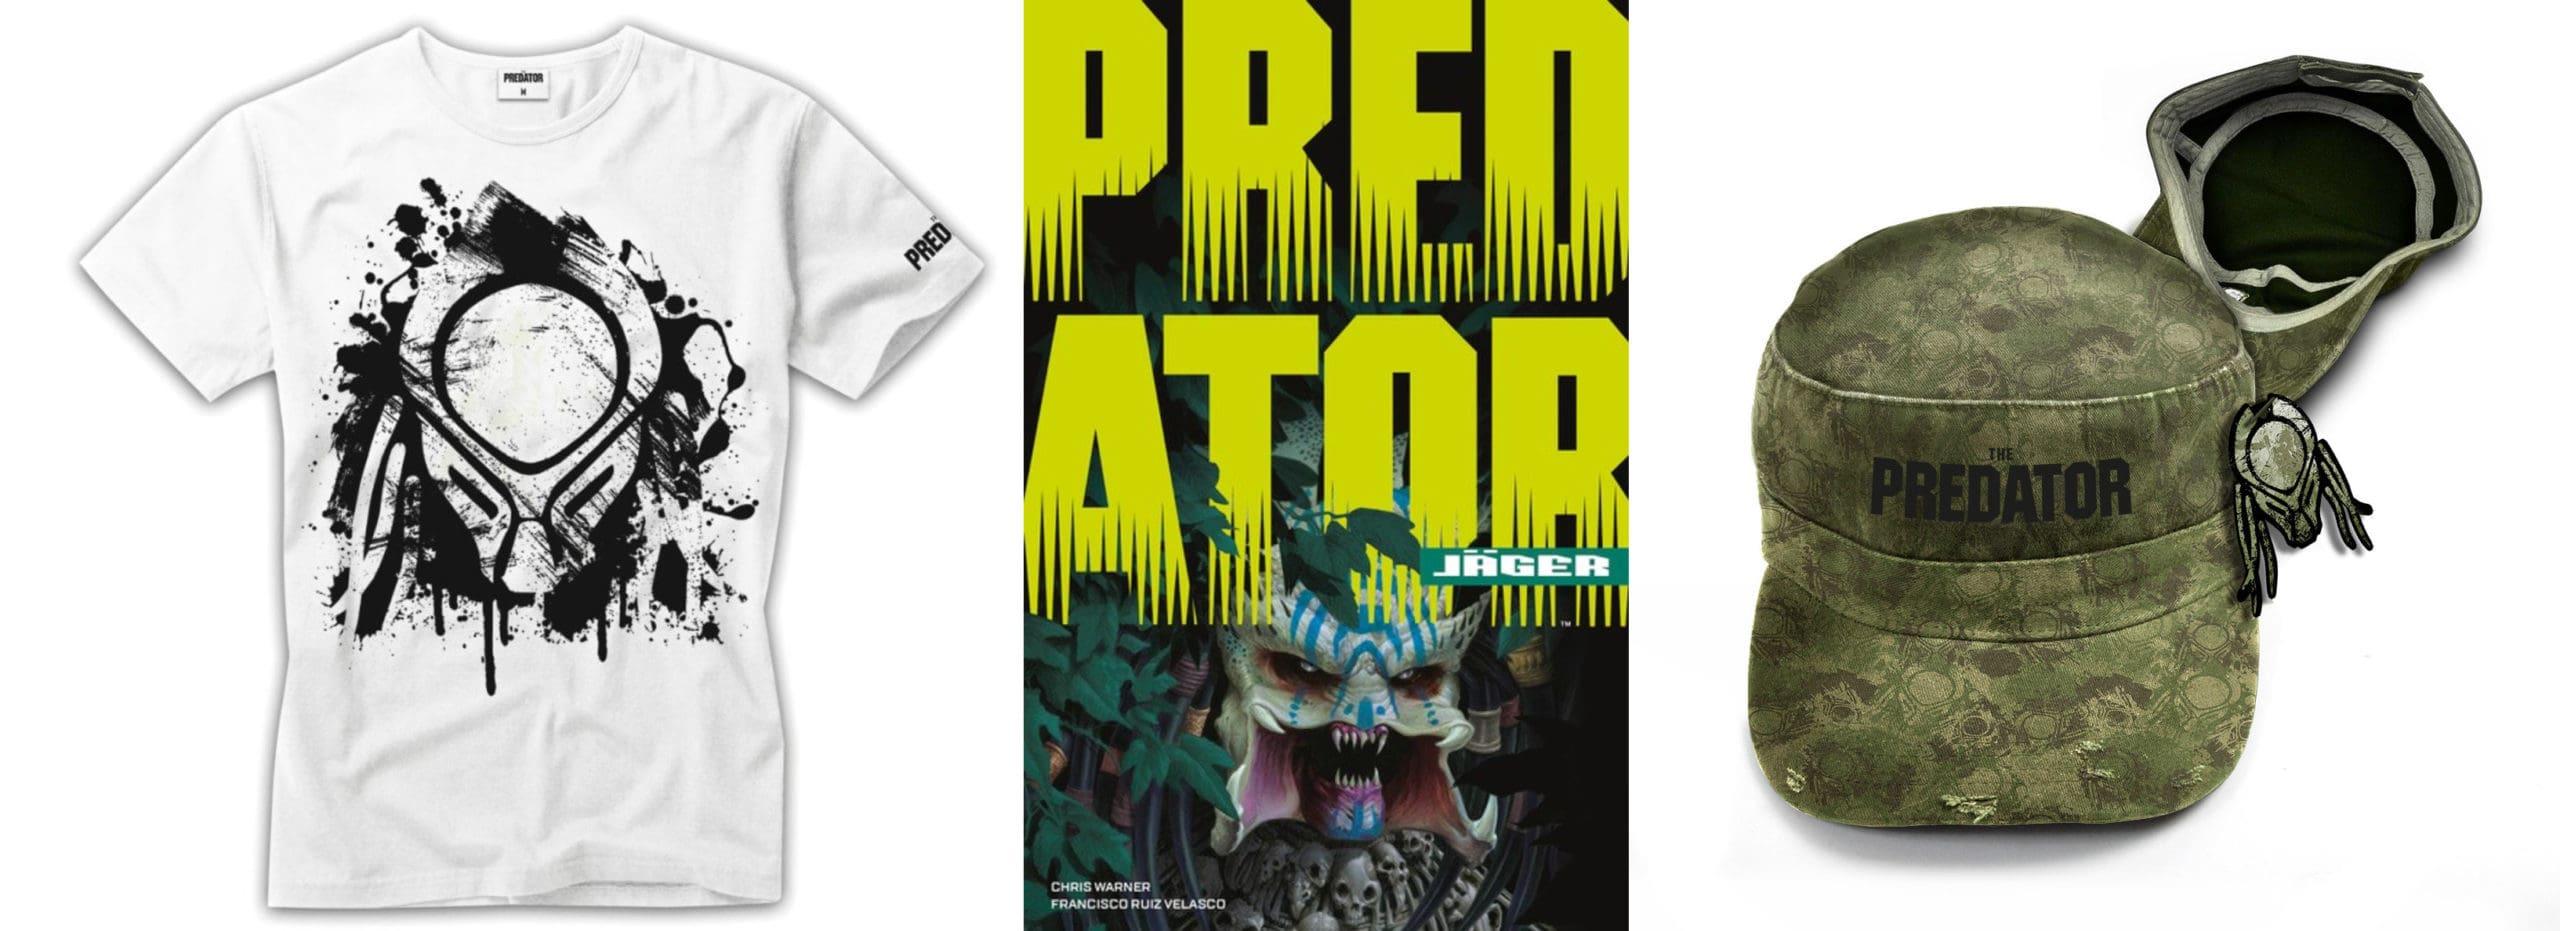 Predator-Upgrade Preise